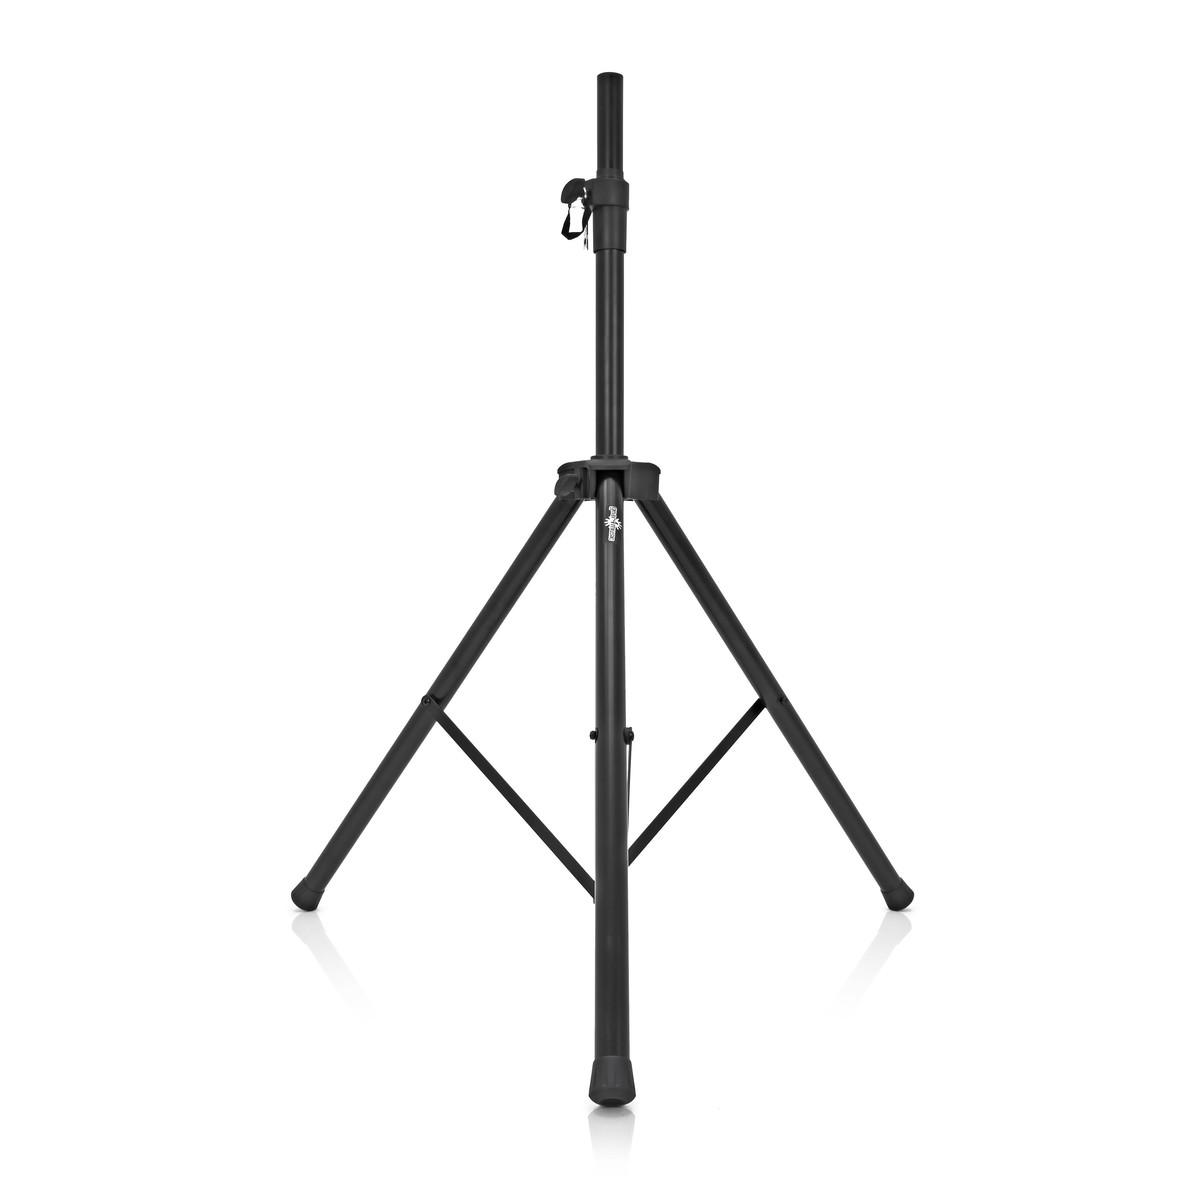 PA Speaker Stand by Gear4music, Single